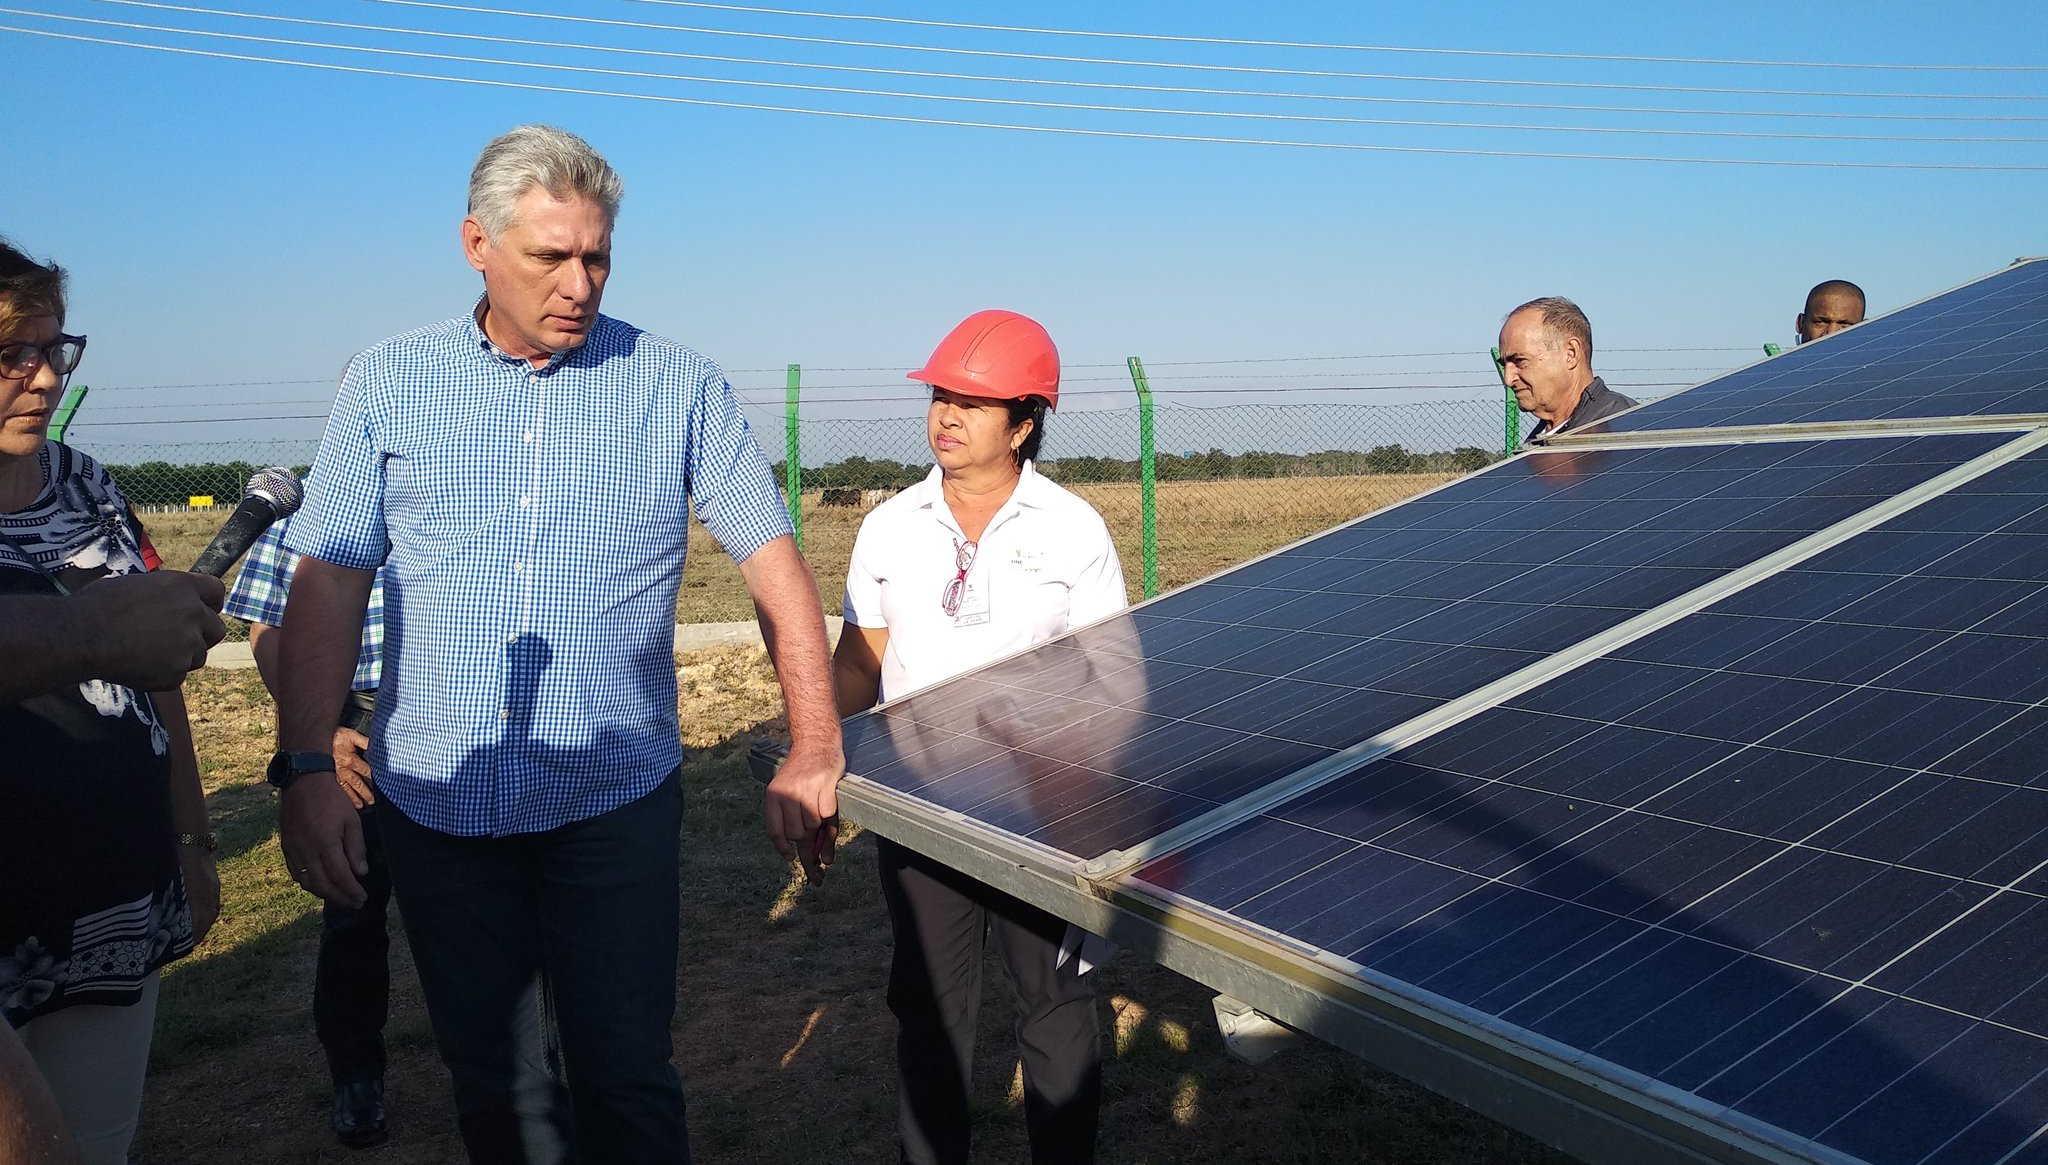 diaz canel en parque fotovoltaico siepre yaima puig meneses 1